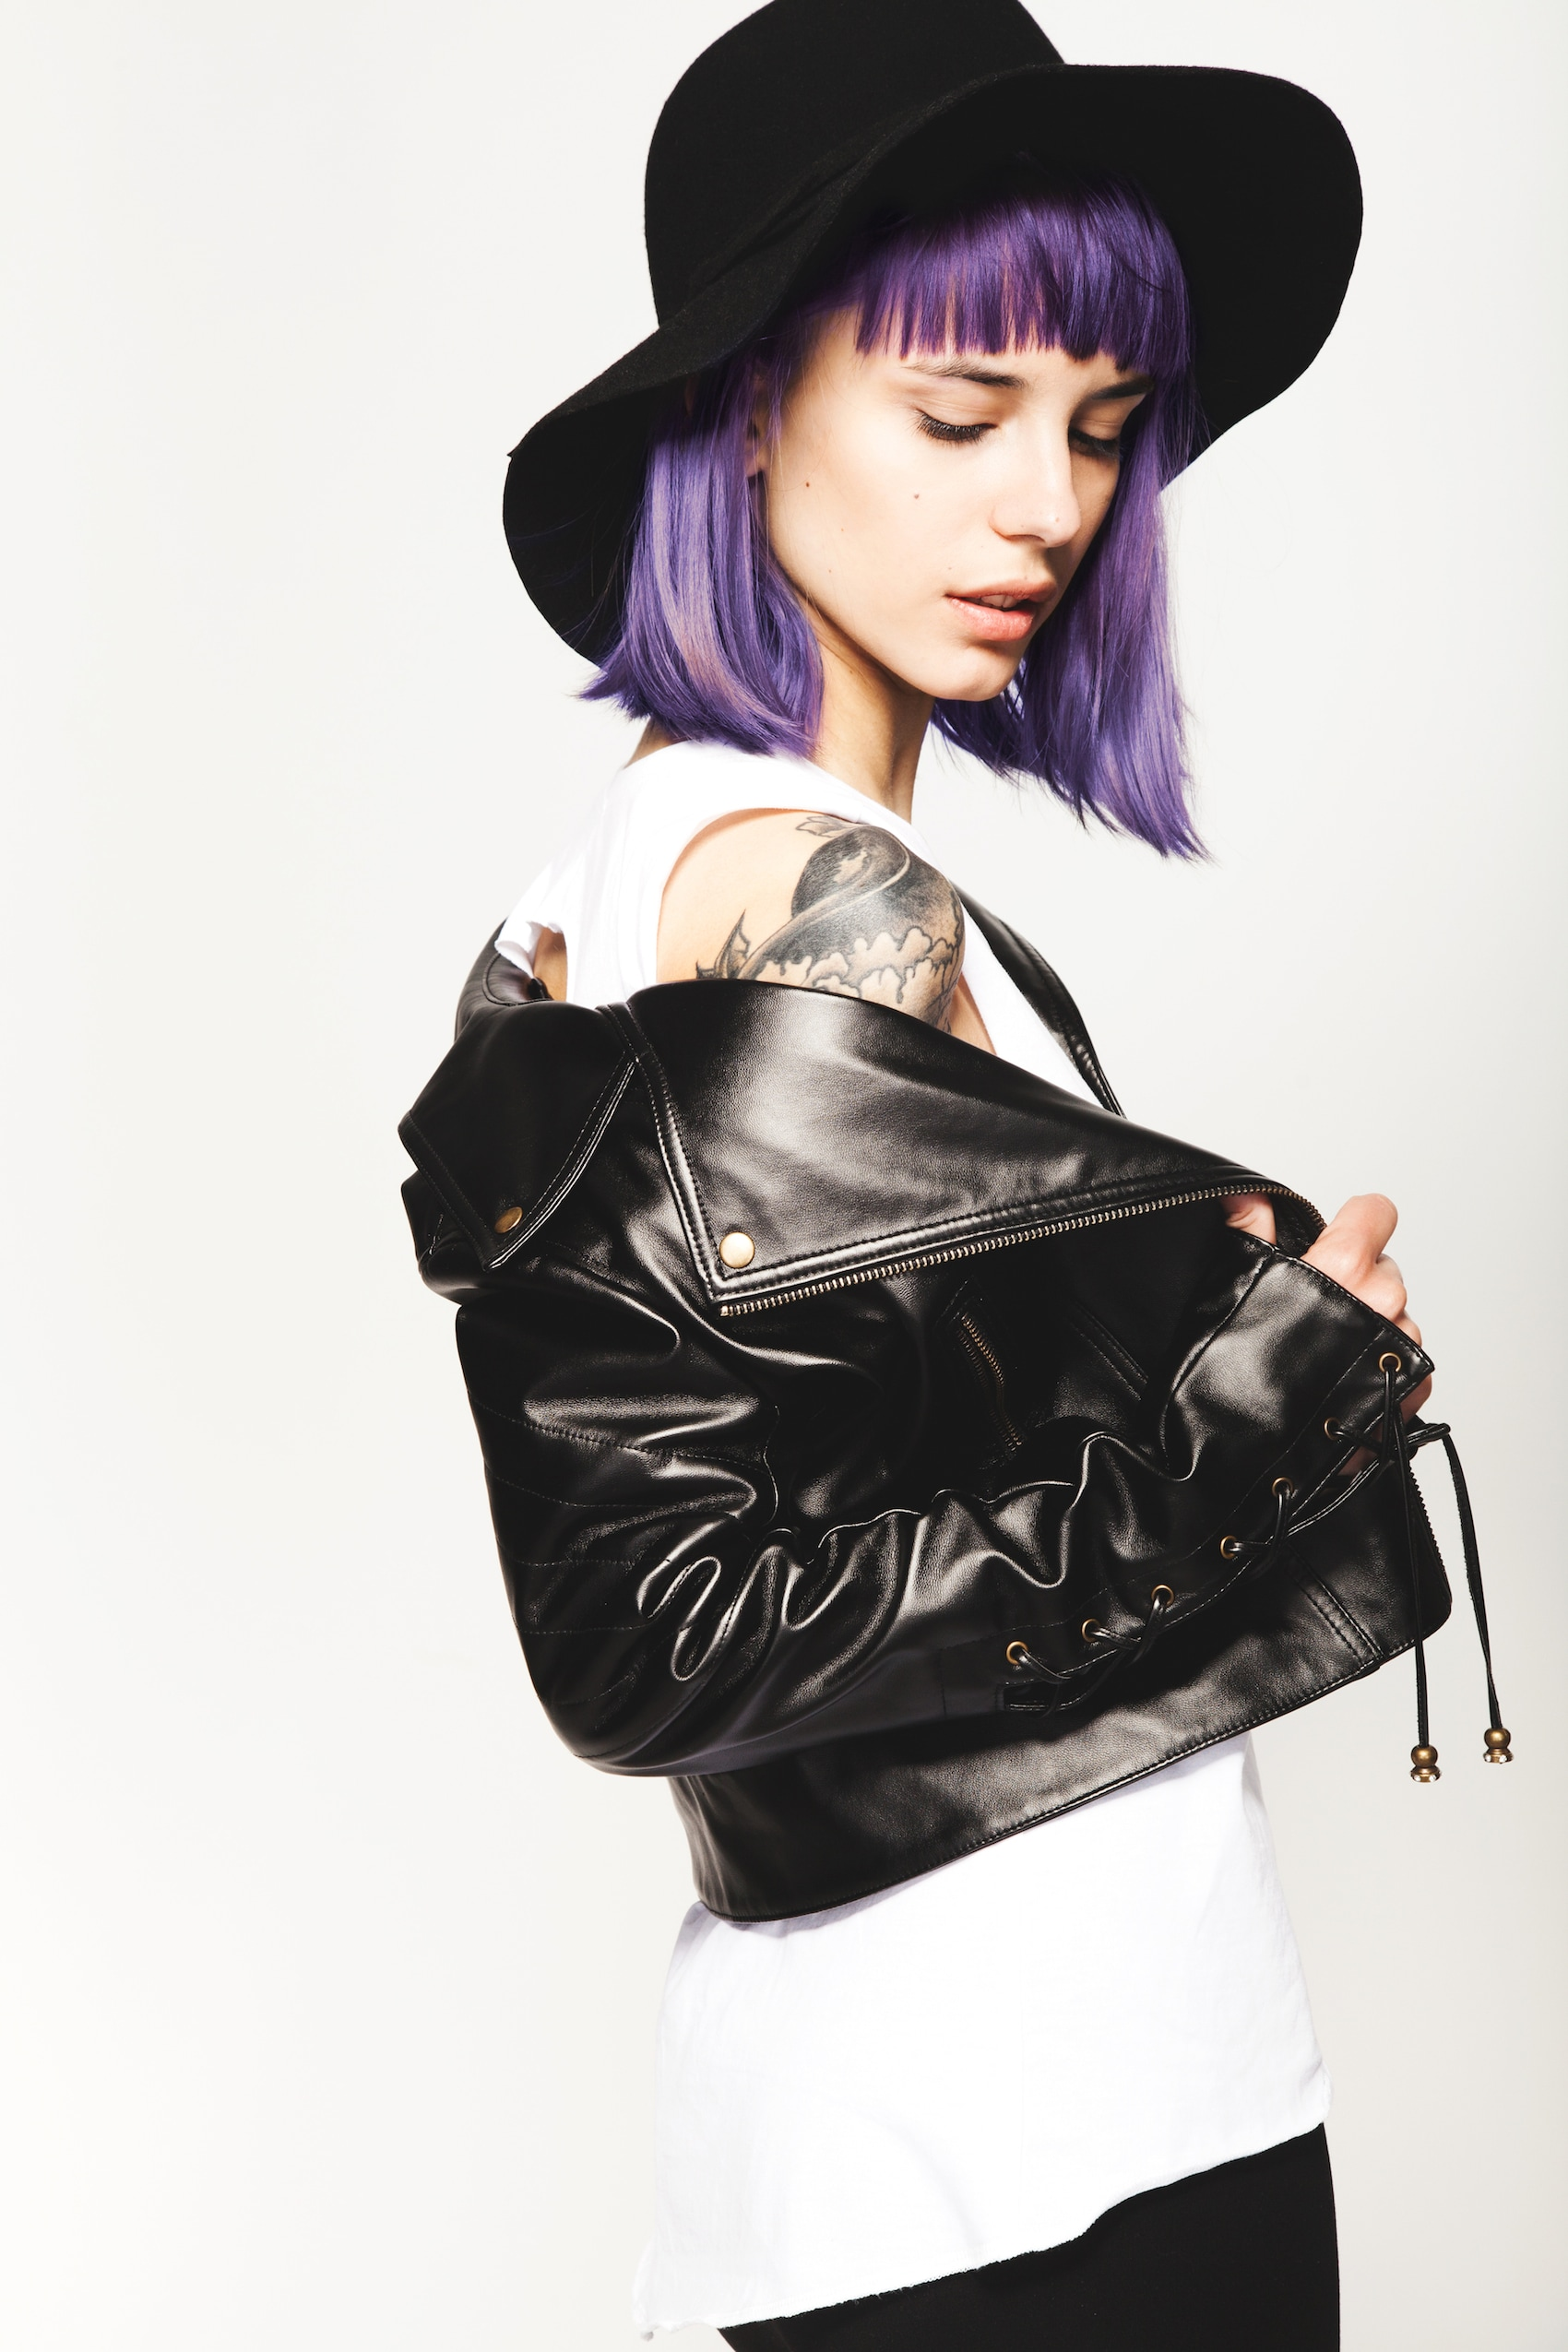 Wanita kaukasia dengan rambut warna ungu menggunakan topi warna hitam dan jaket kulit